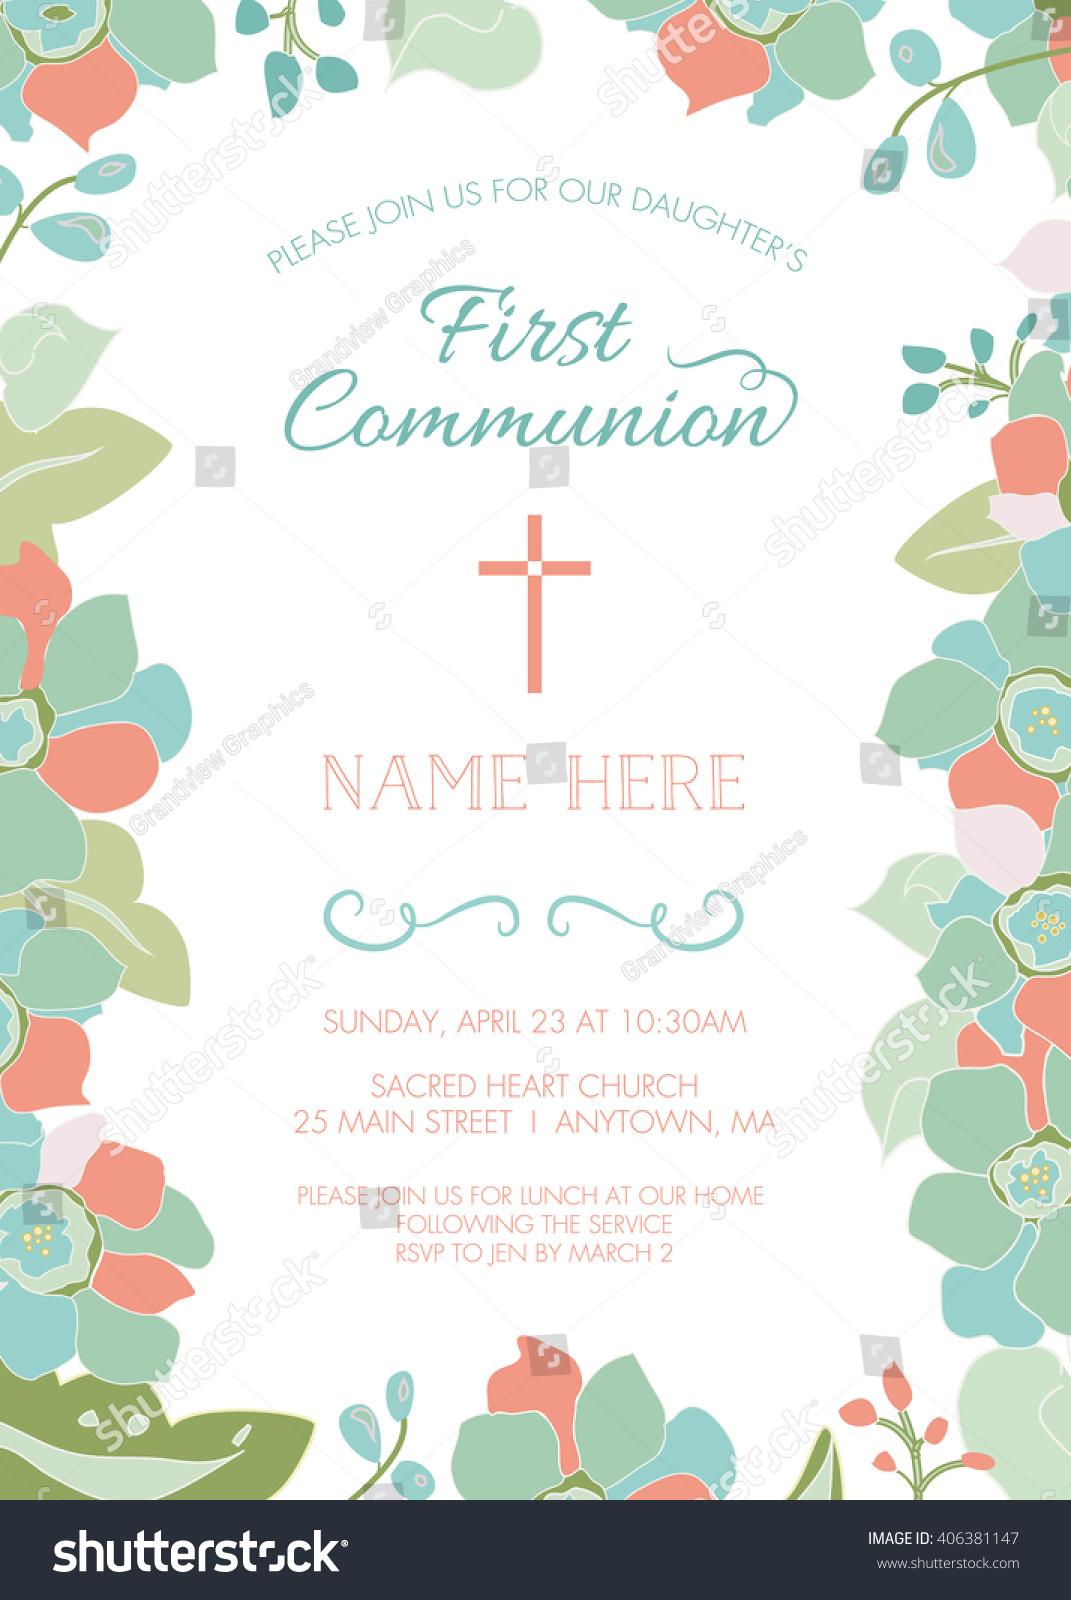 First Communion Baptism Christening Invitation Card Vector – Christening Invitation Cards Templates